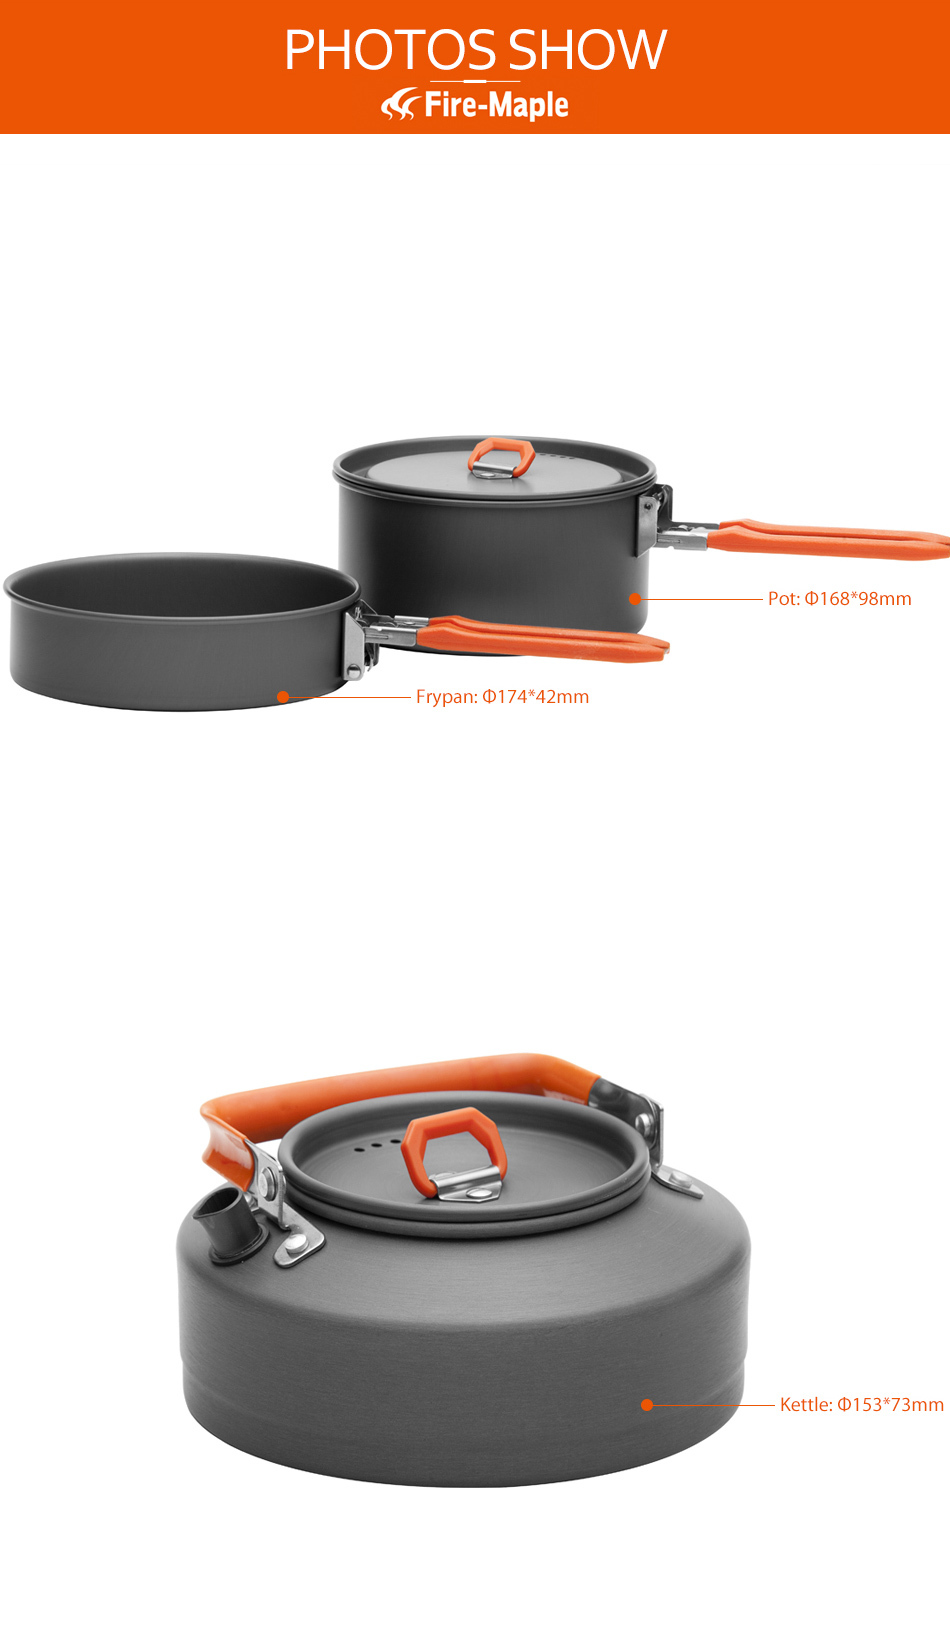 Livre Panelas Chaleira Caminhadas Cooking Frypan Pot